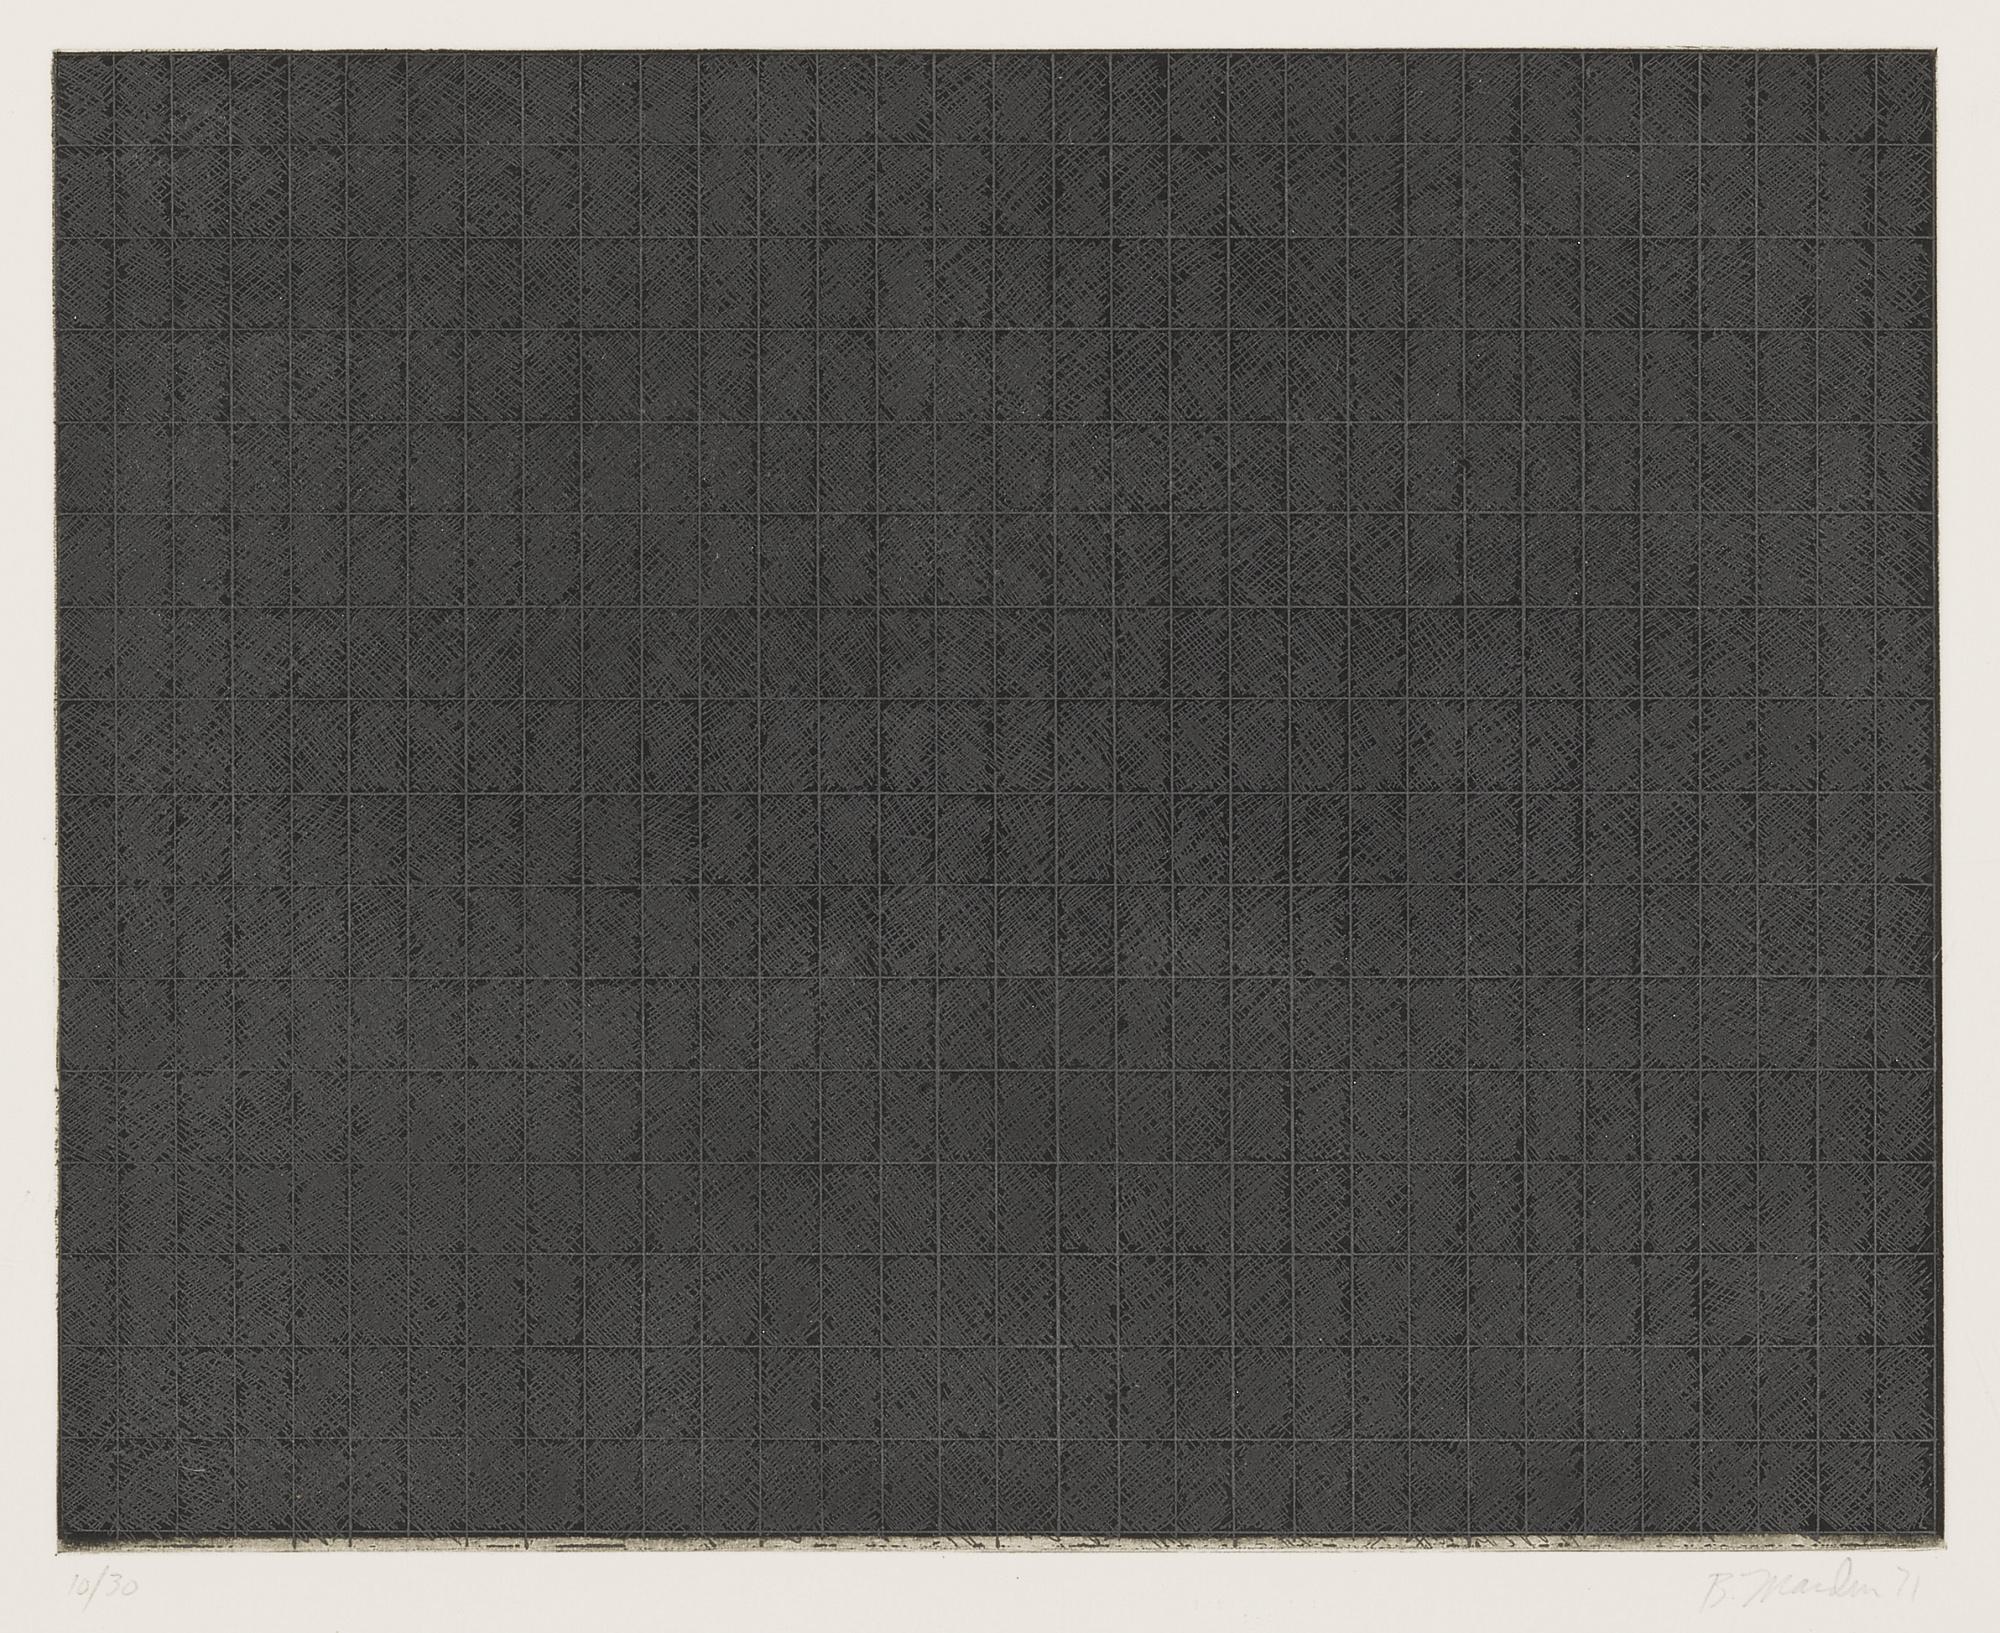 Brice Marden-Ten Days (L. 20 (E))-1972